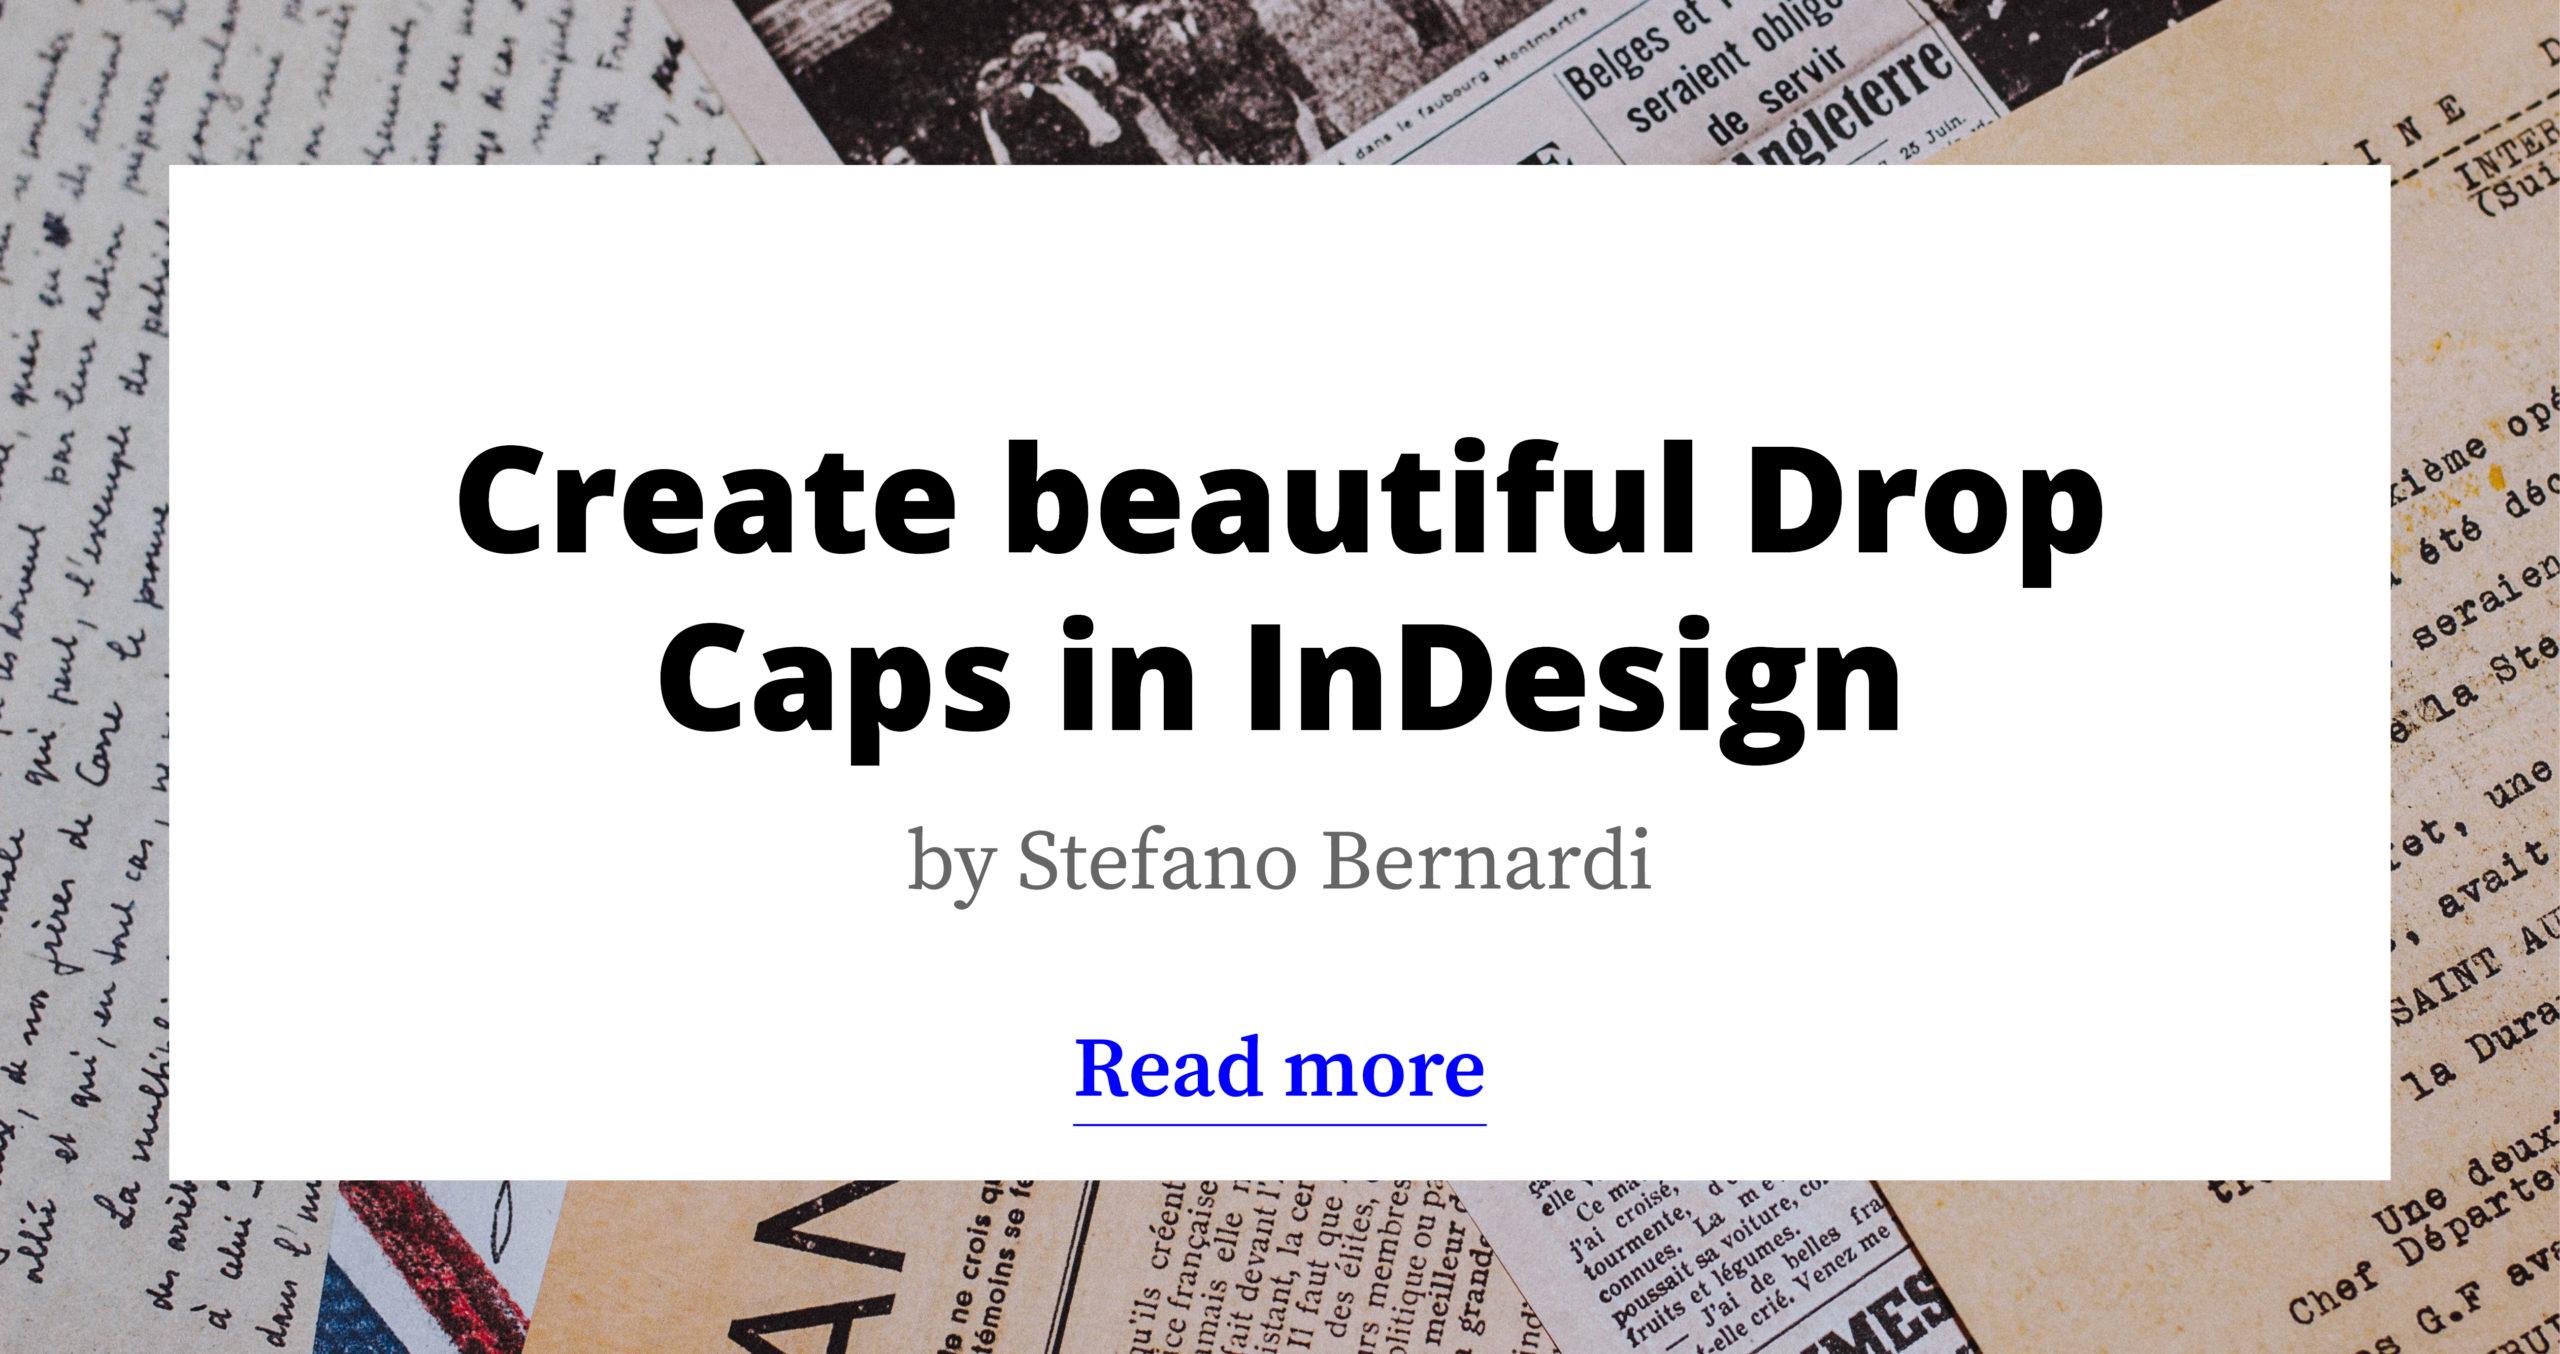 Create beautiful Drop Caps in InDesign